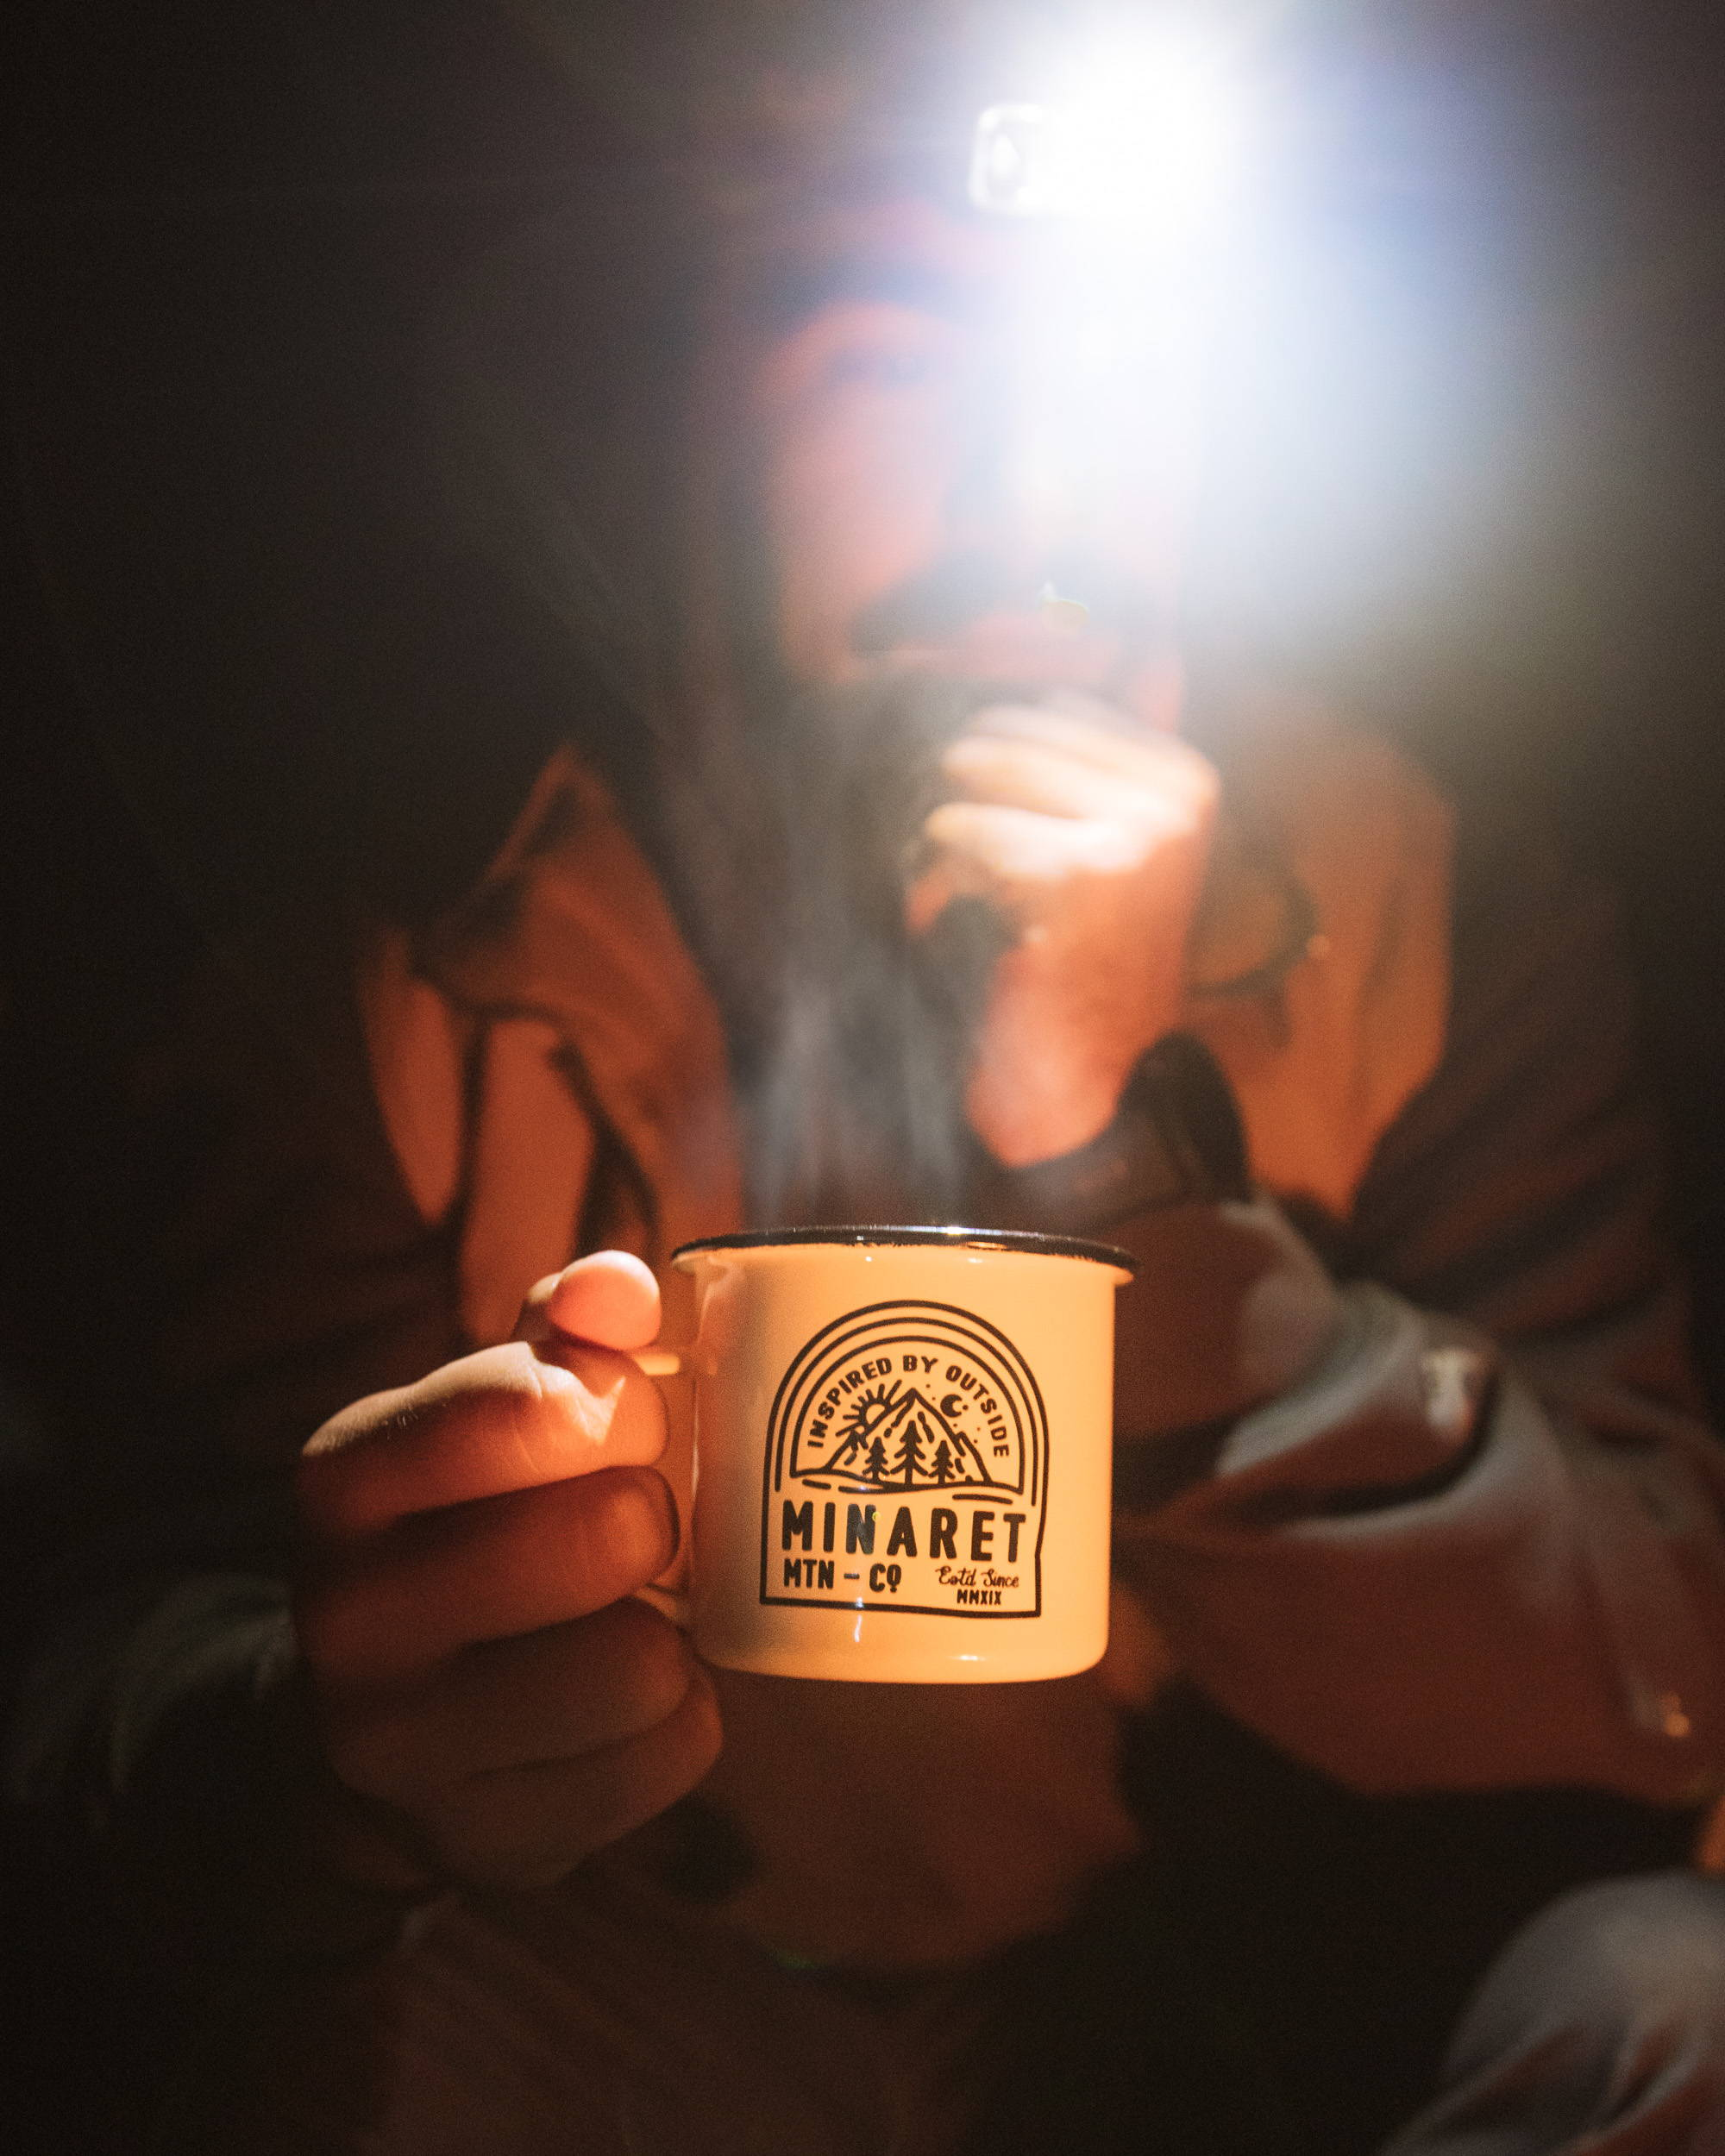 Minaret enamel camping mug with steam